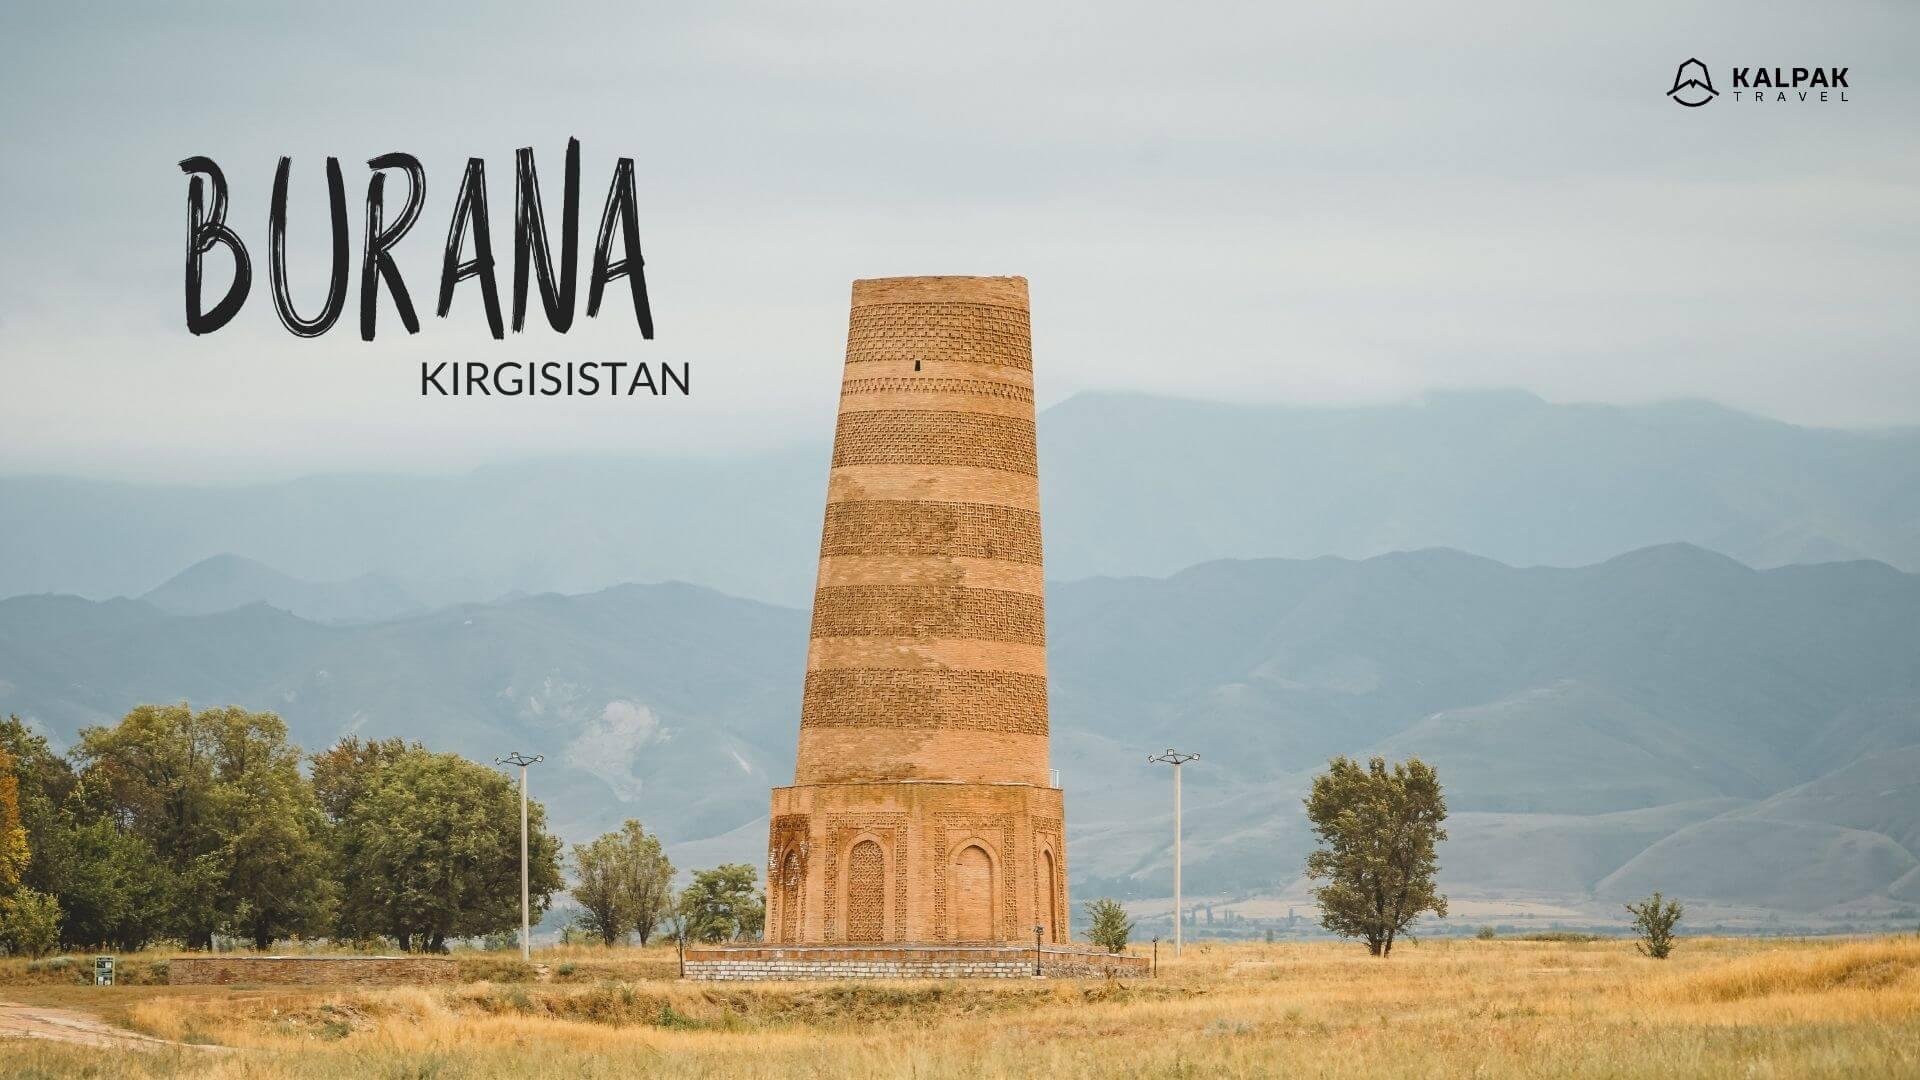 Burana in Kirgisistan